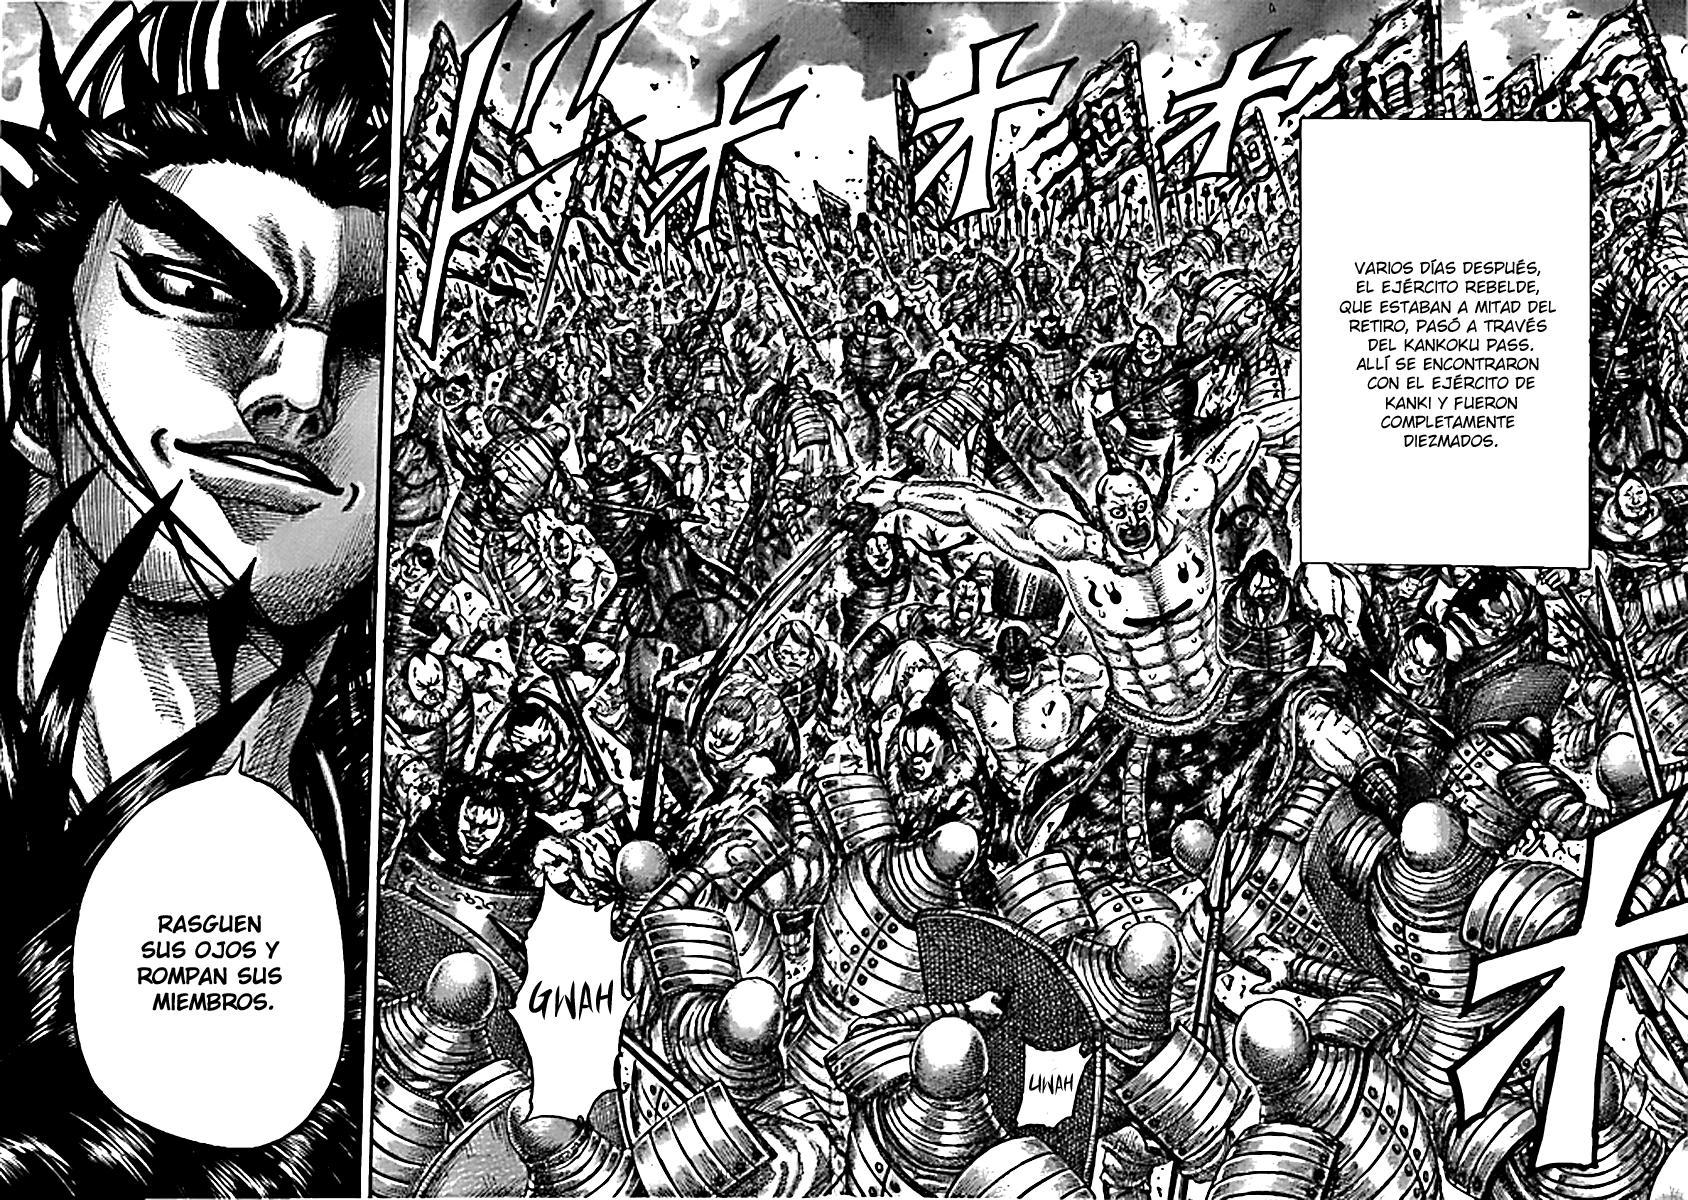 http://c5.ninemanga.com/es_manga/19/12307/380818/4ed7fa9f84644b49d65a4a784f49bd8a.jpg Page 18